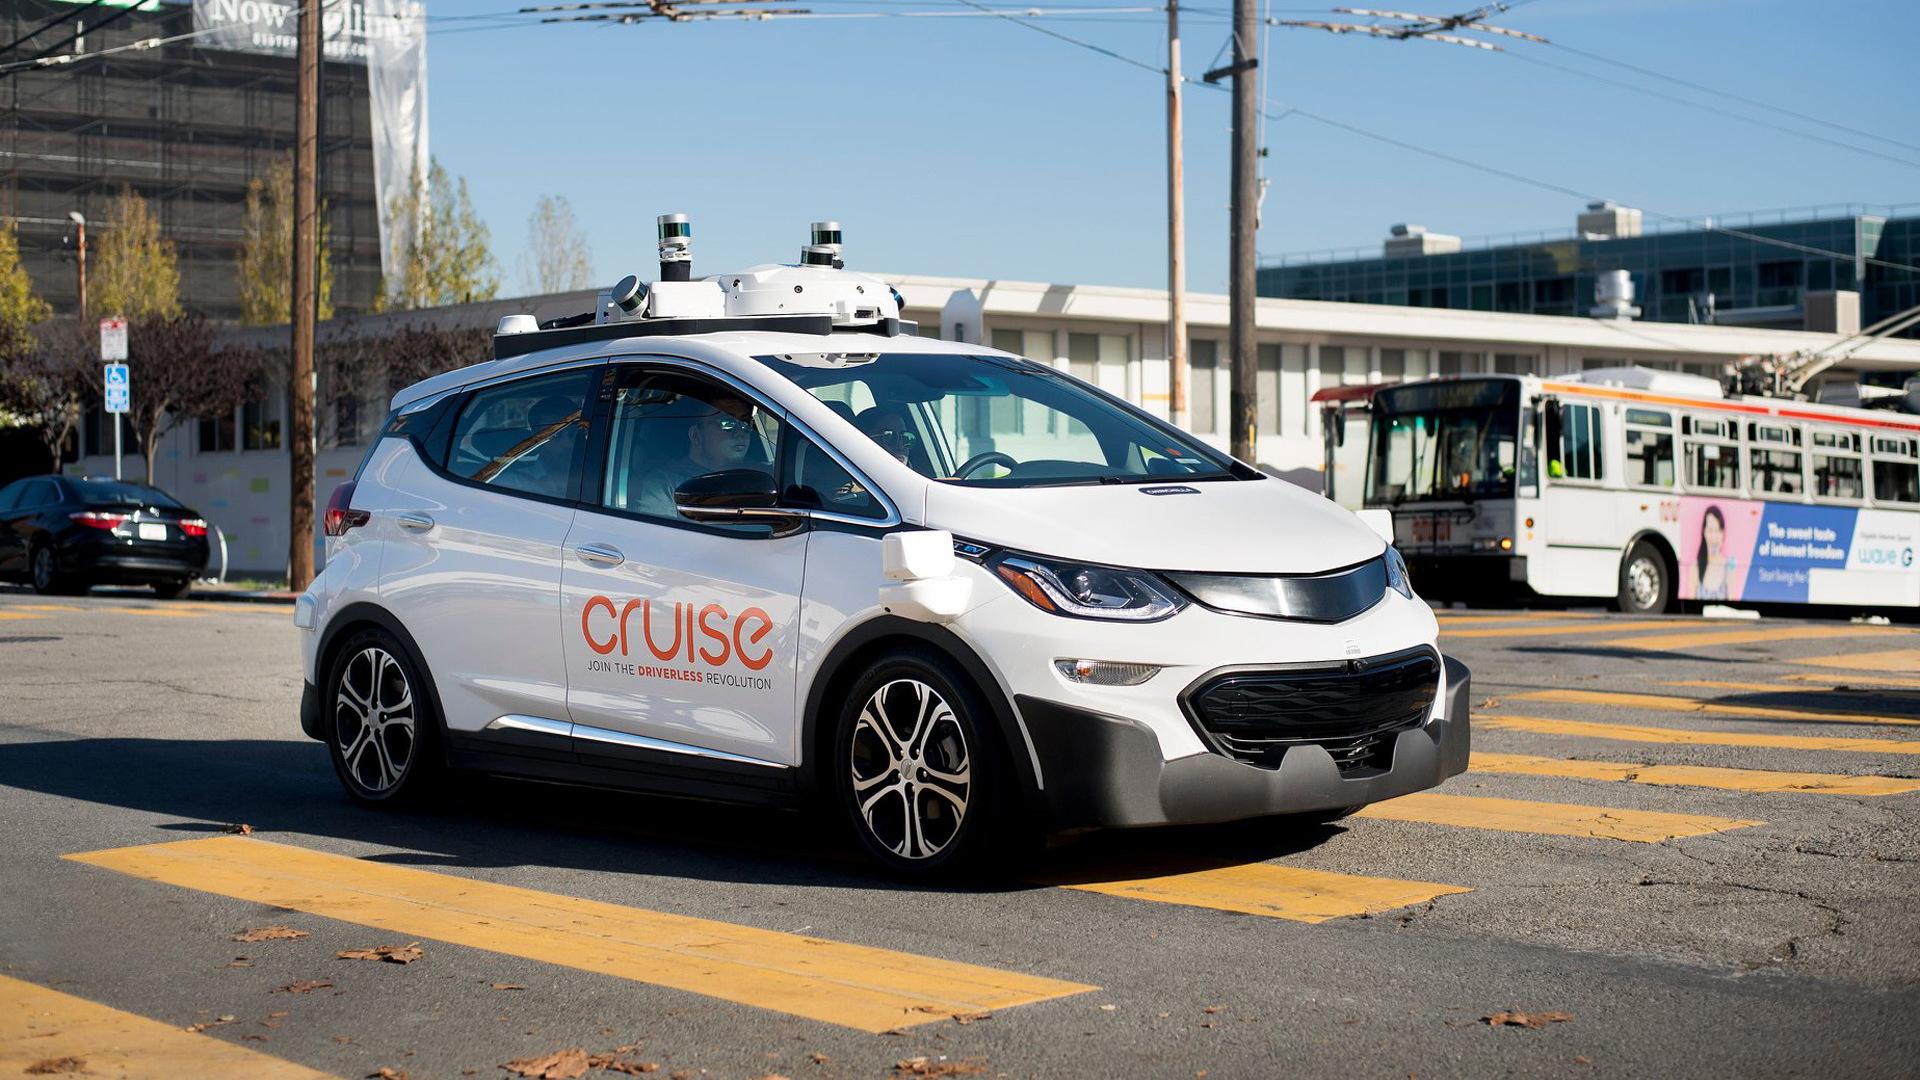 Cruise self-driving car prototype